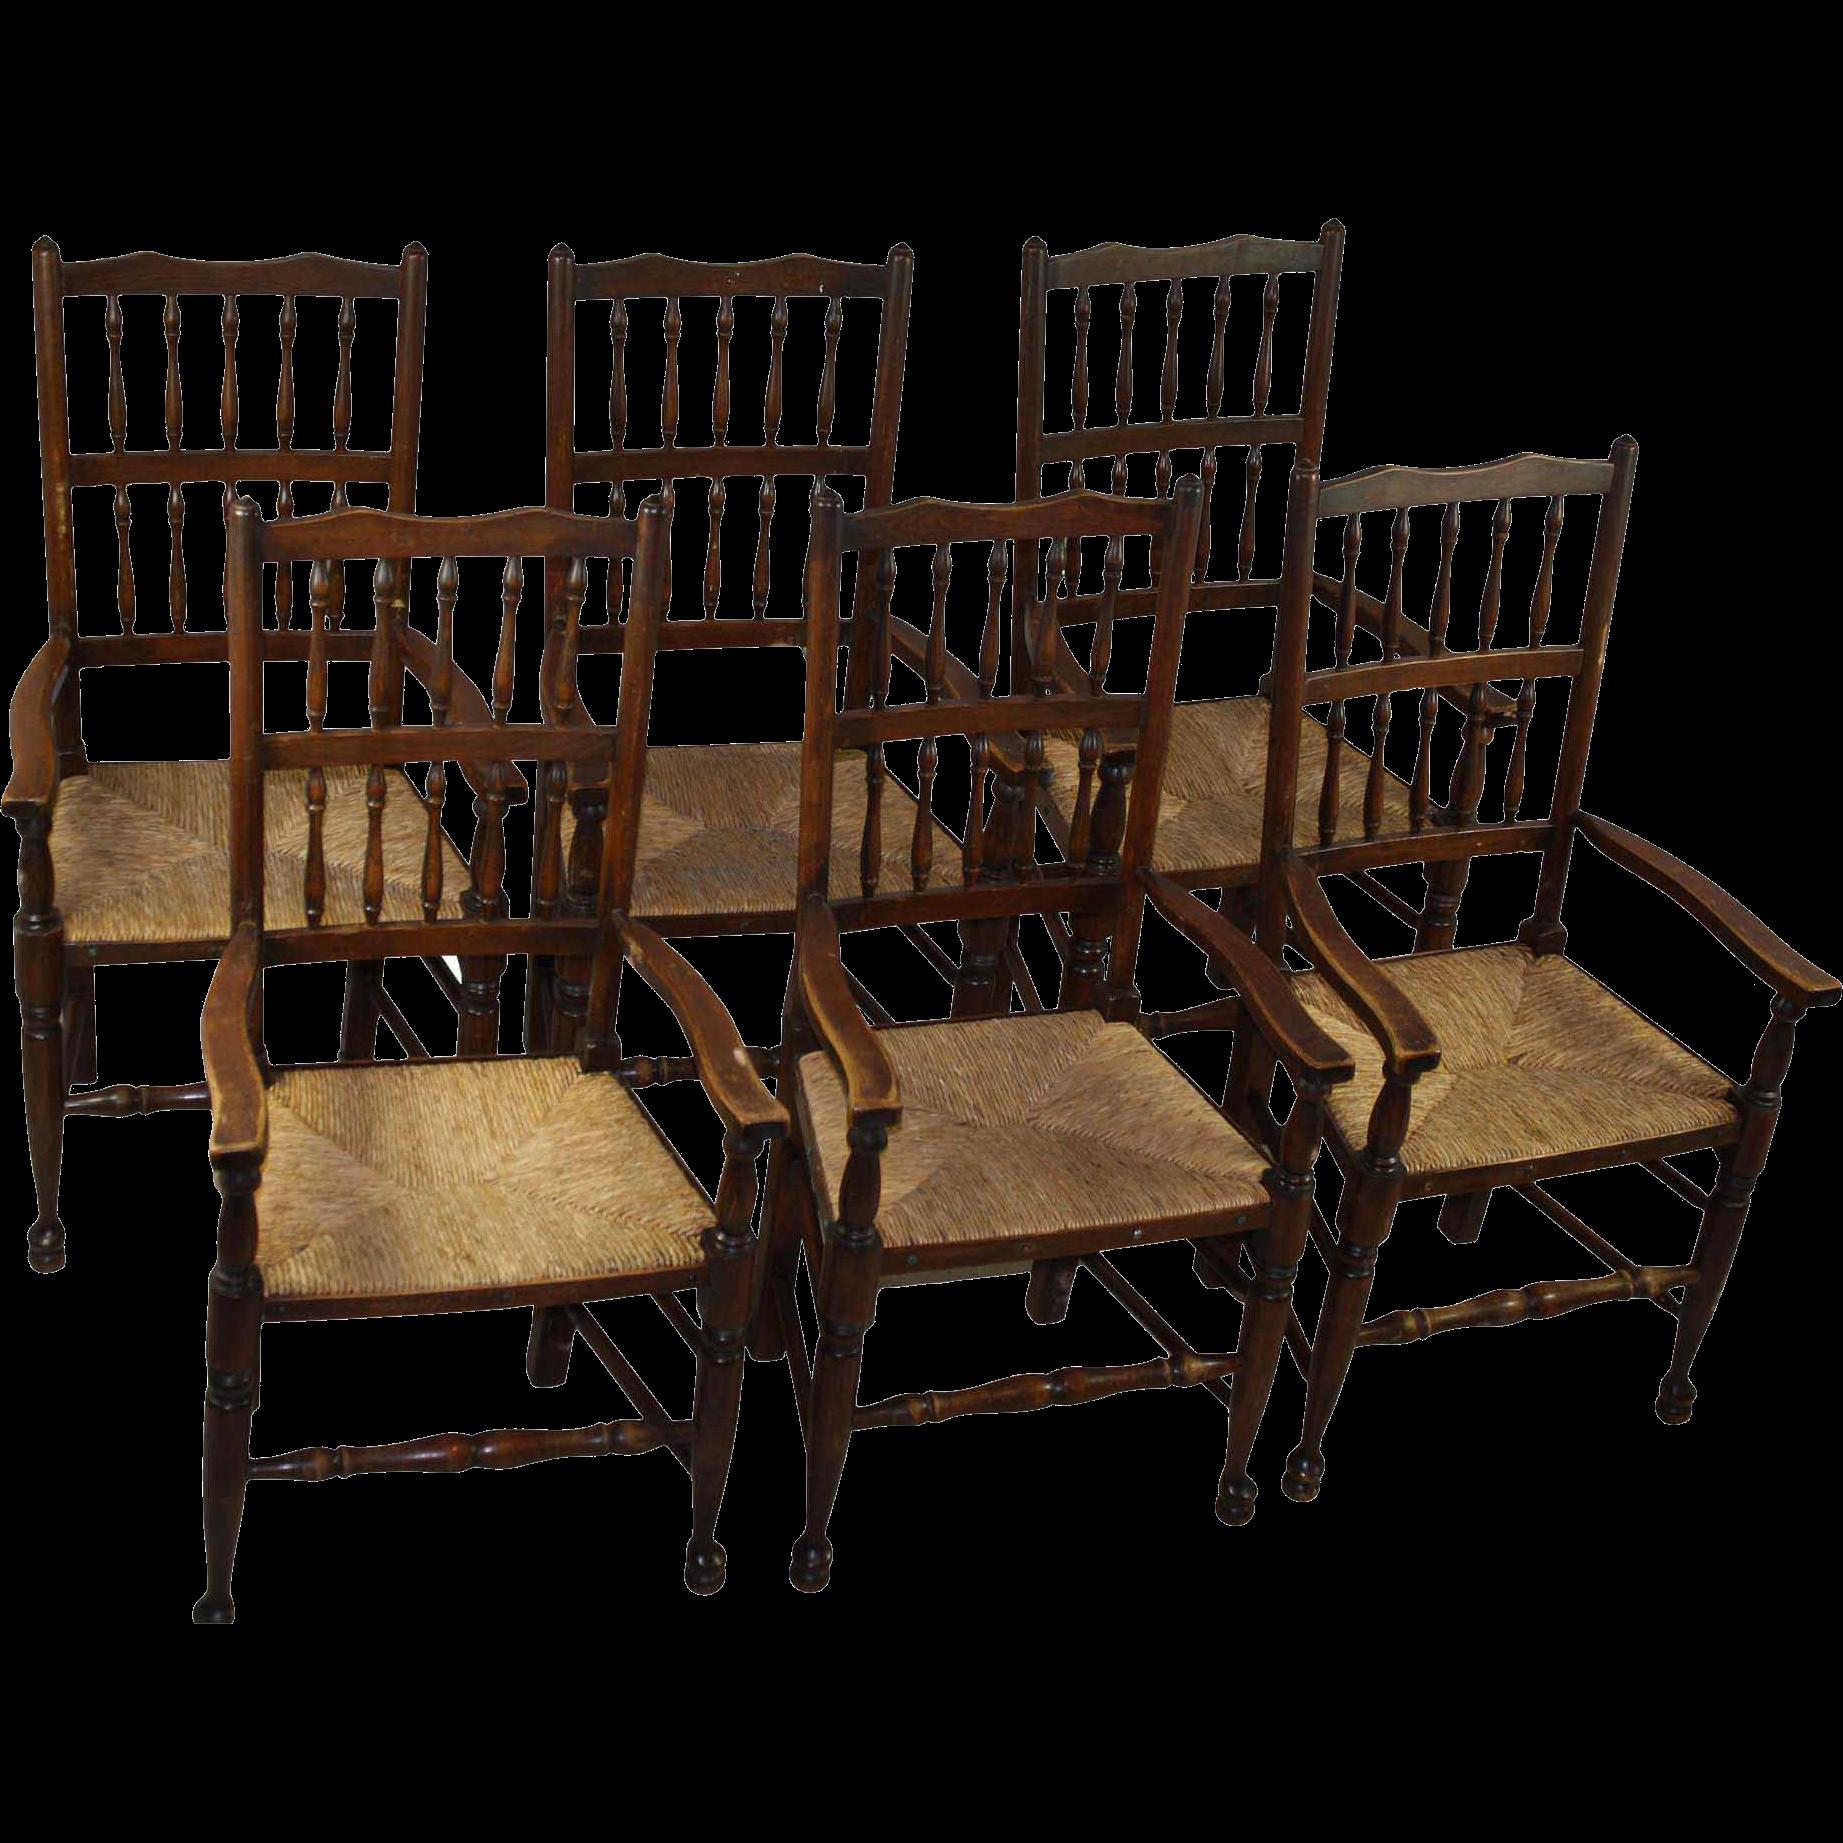 Antique Farm Chairs Set Of 6 Shop Wwwrubylanecom At Rubylanecom